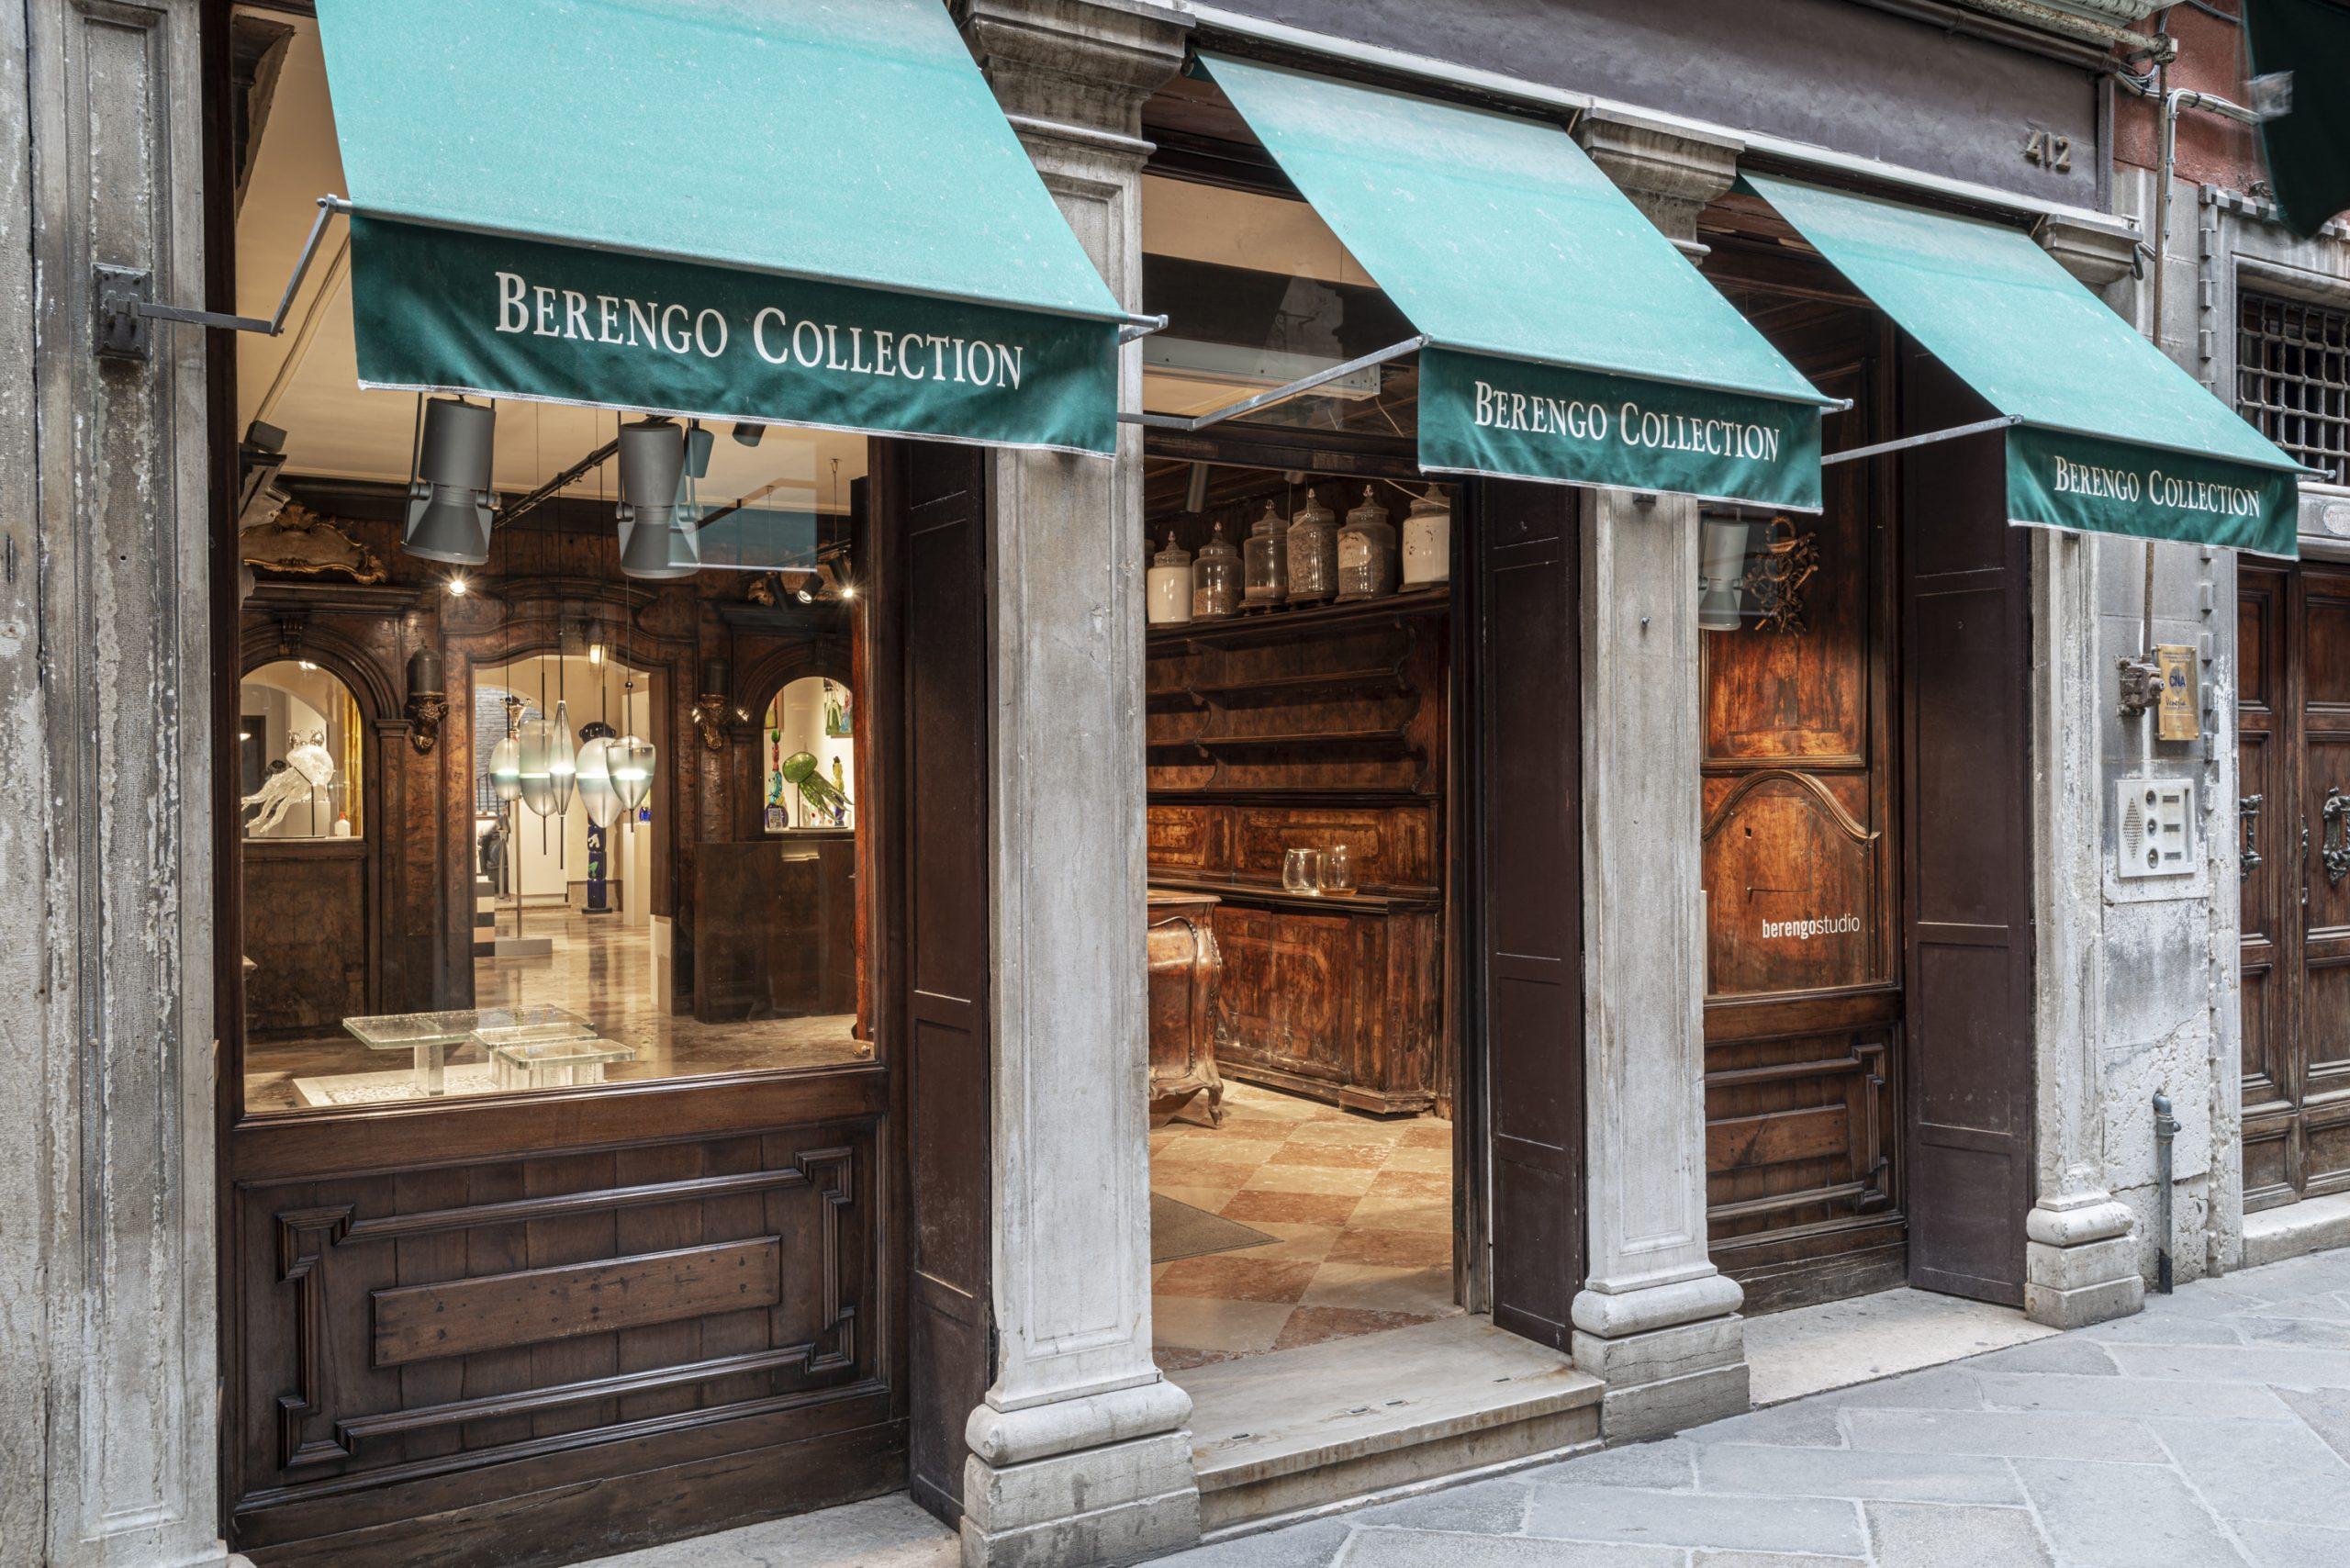 Berengo Collection, San Marco